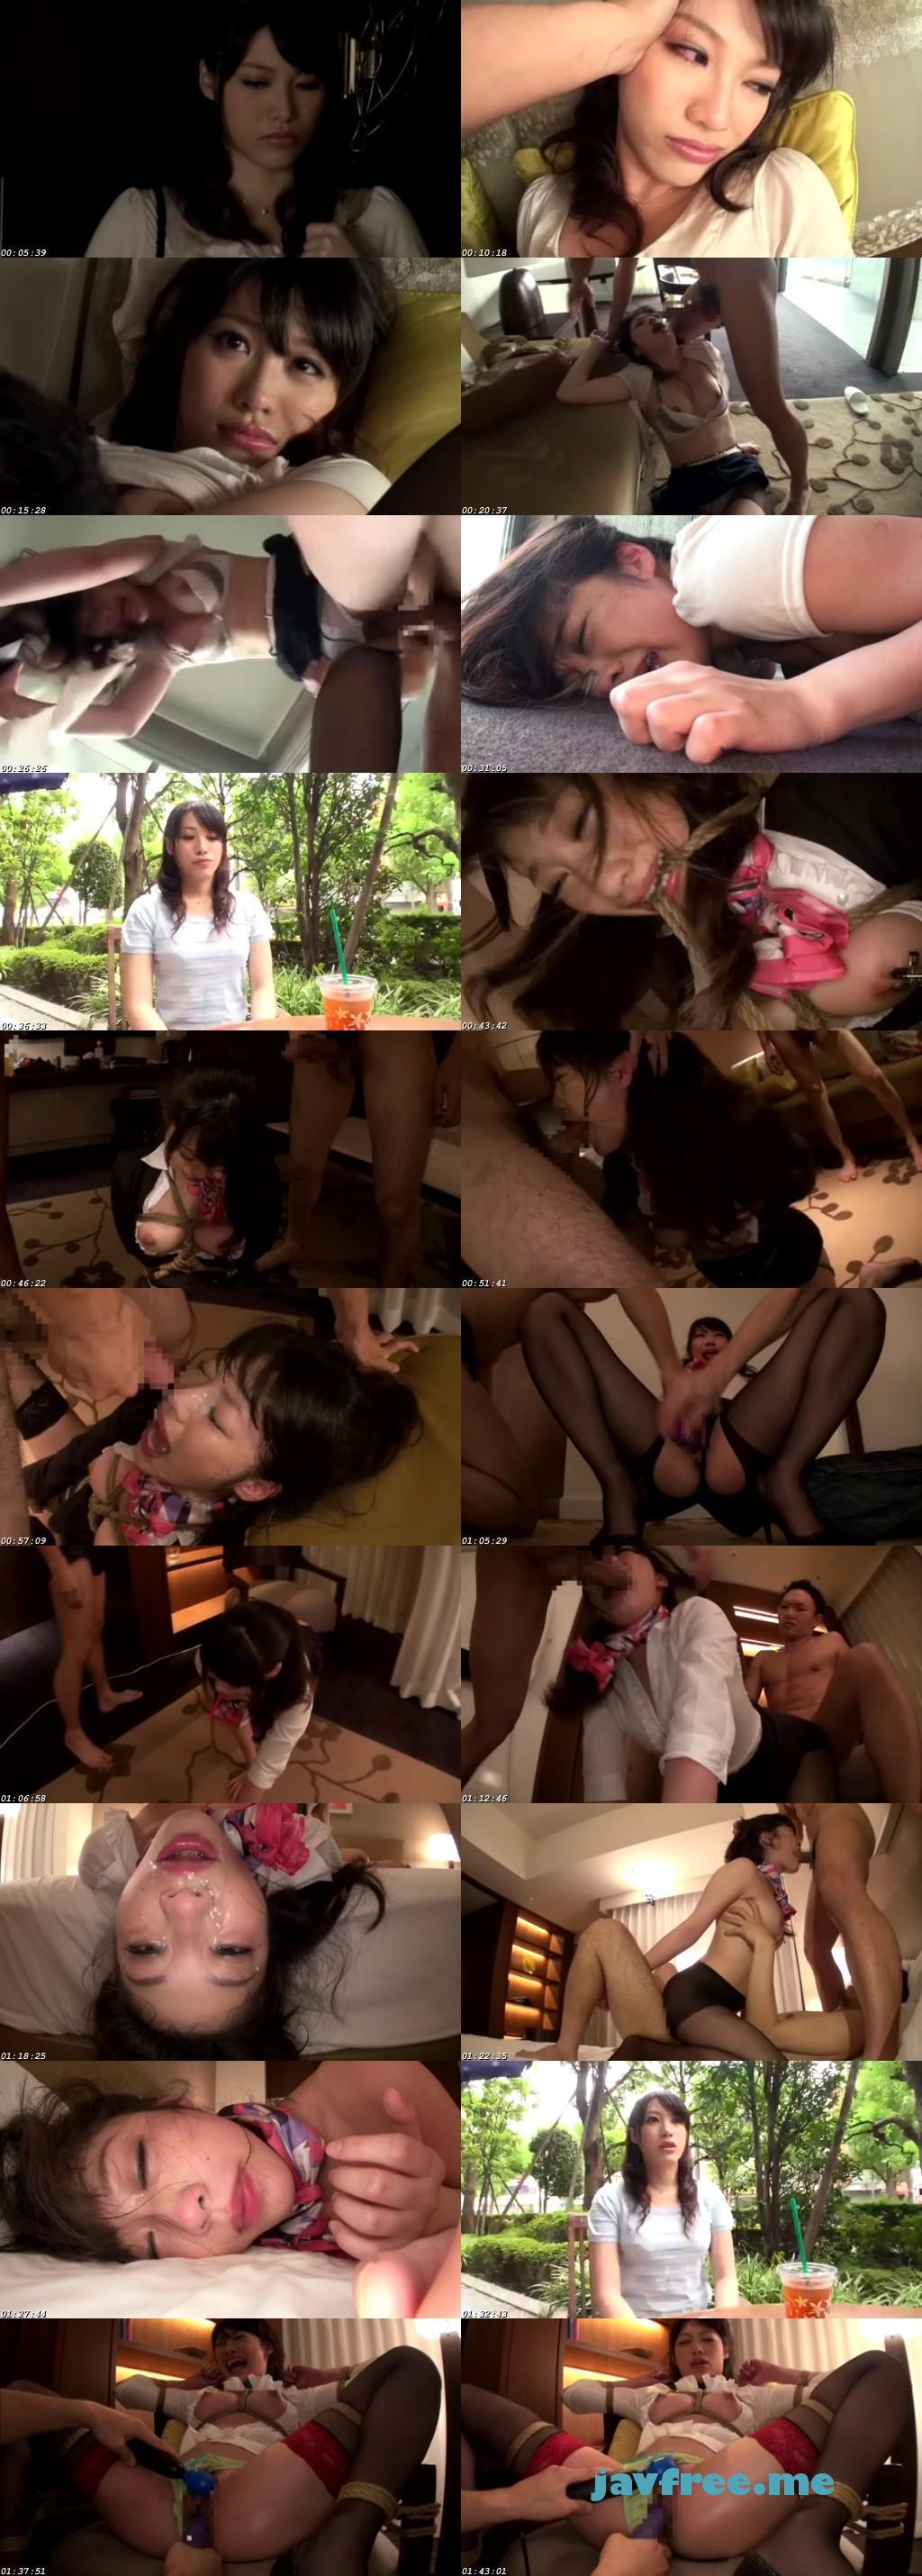 [VDD 074] 受付嬢in… [脅迫スイートルーム] Miss Reception Miki(21) 春原未来 VDD